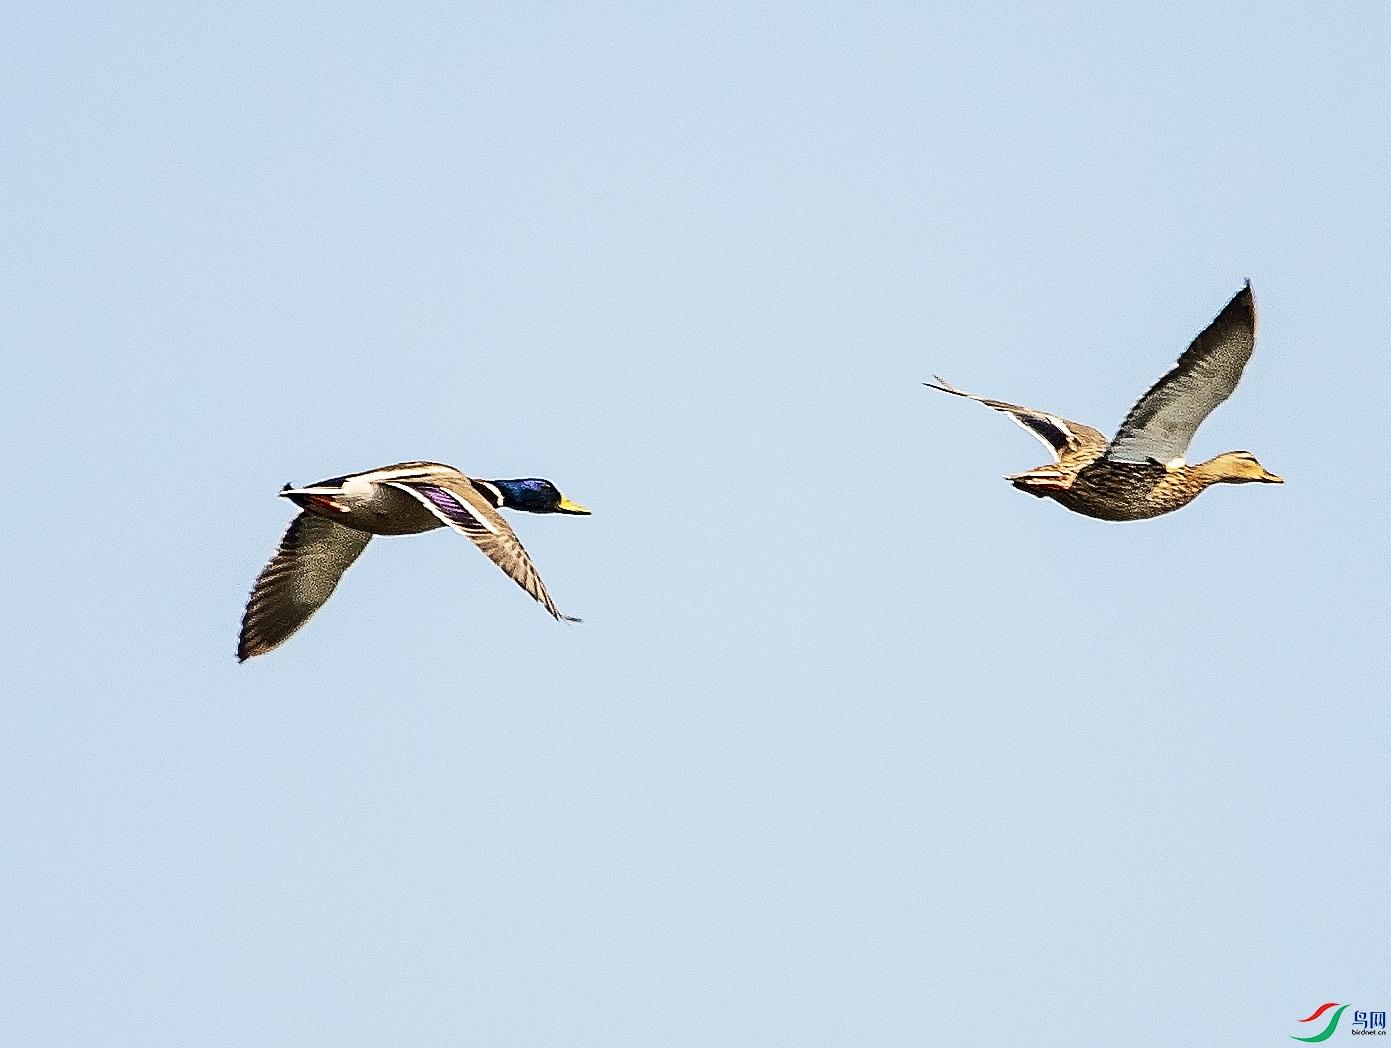 DSC_4777 鸟网.jpg